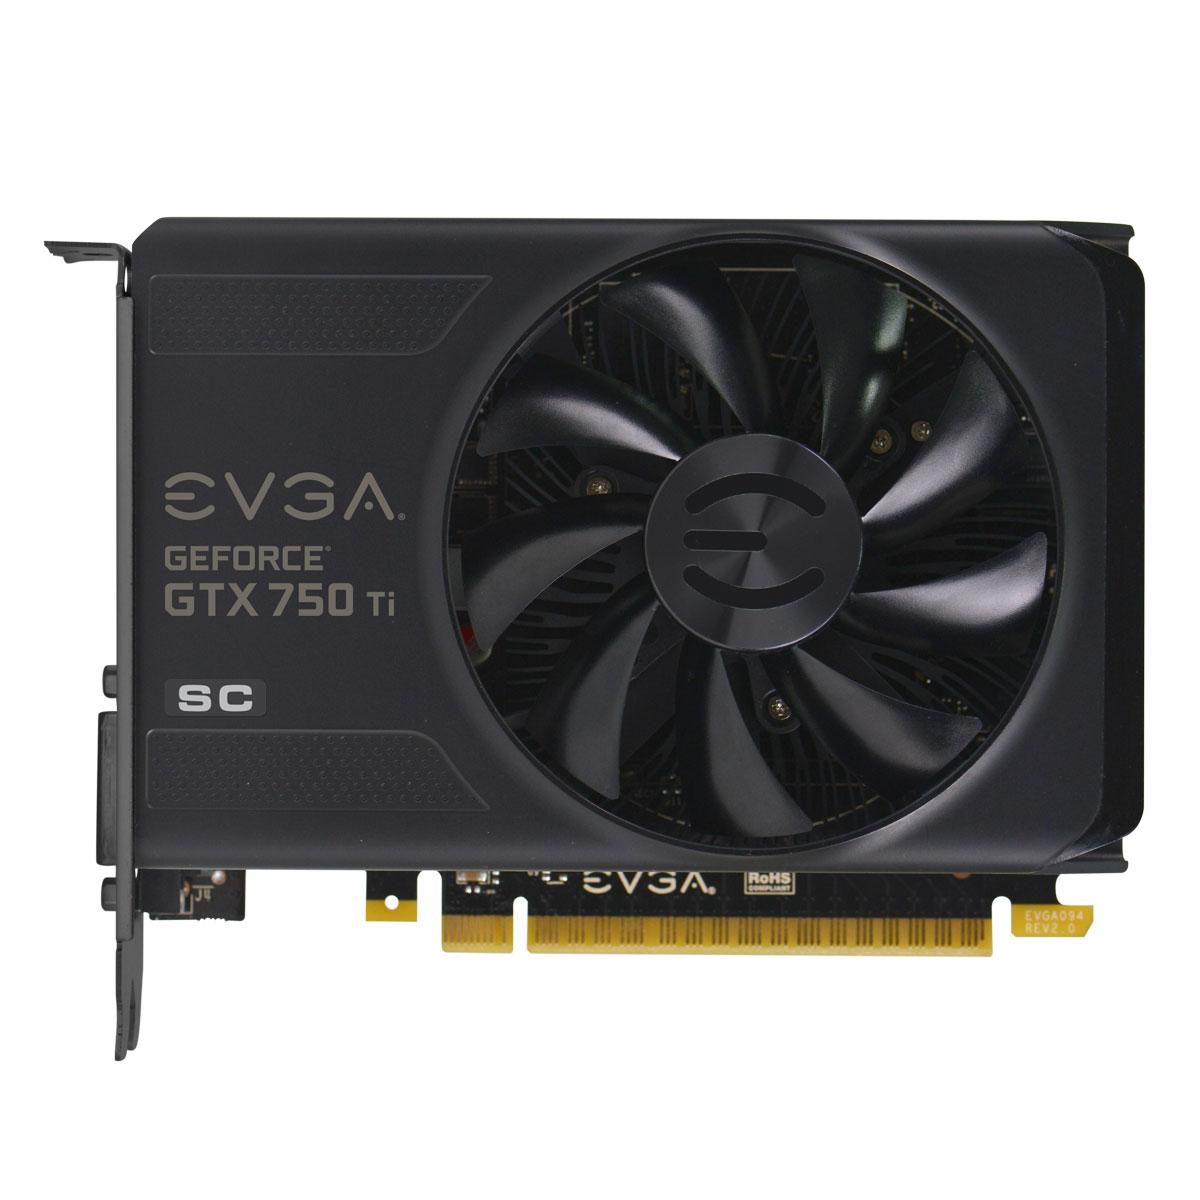 Placa de Vídeo Geforce GTX750 Ti 2GB SC DDR5 128Bits 02G-P4-3753-KR - EVGA